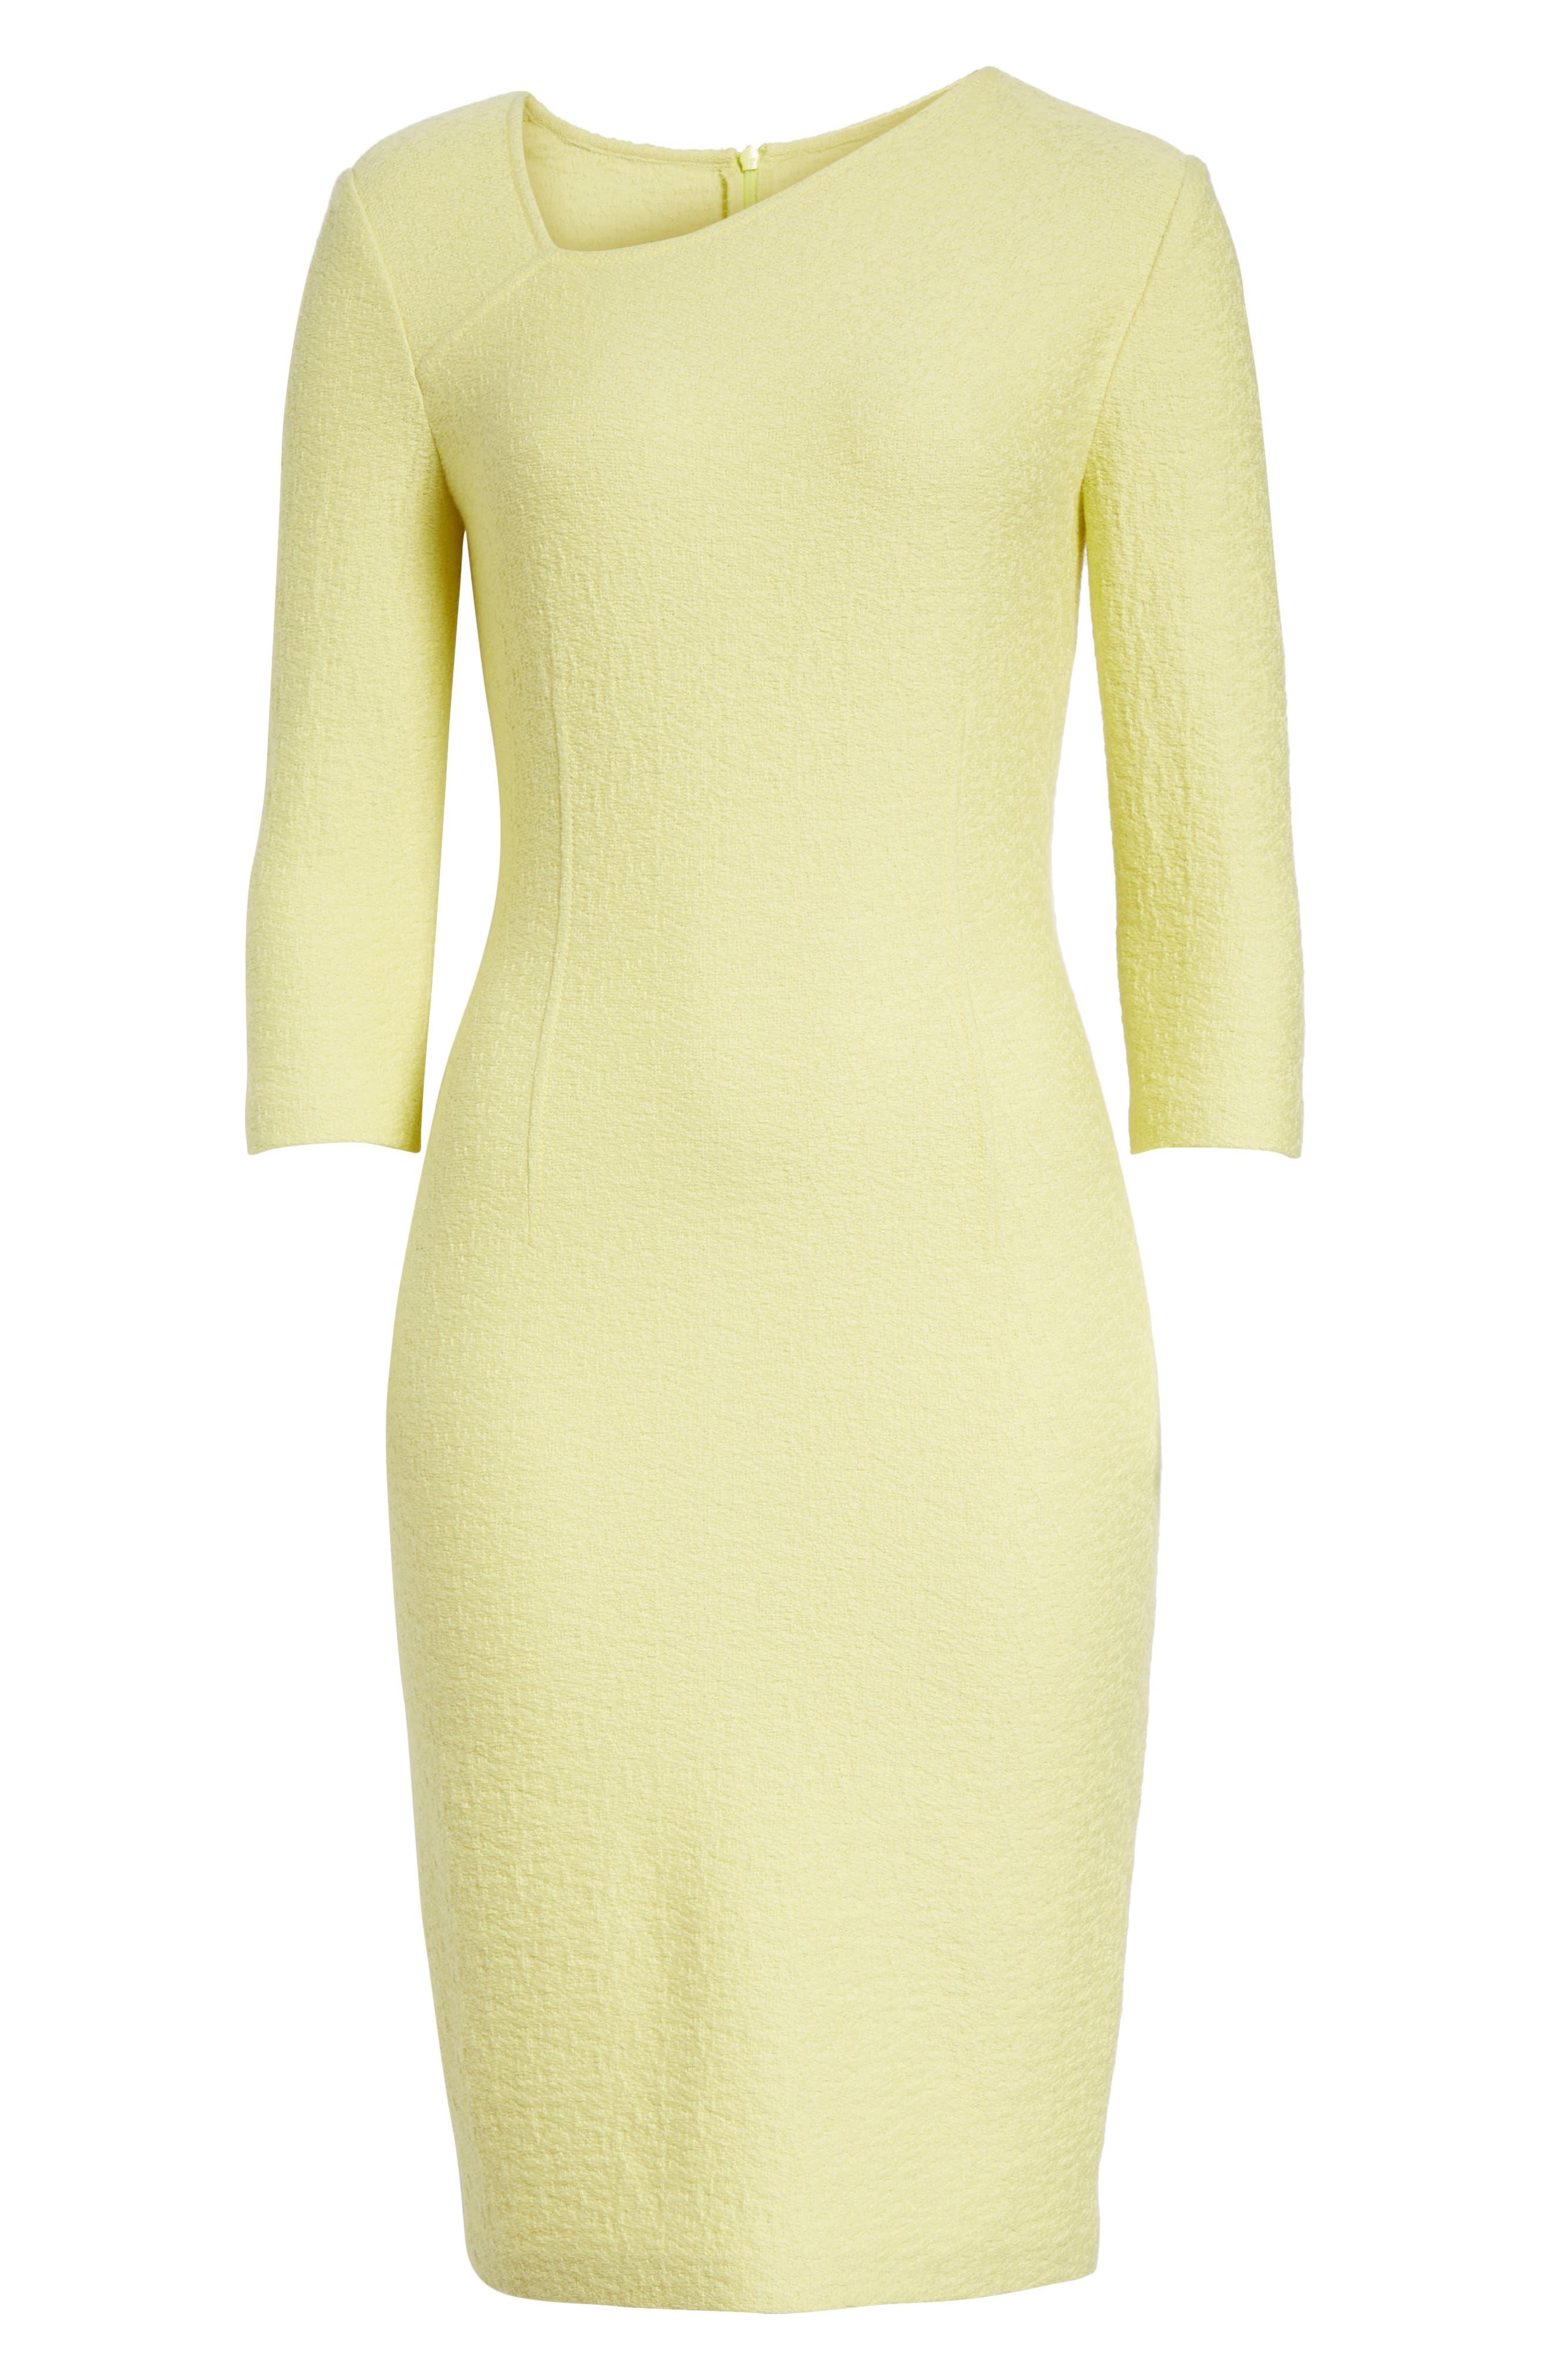 Hannah Knit Asymmetrical Sheath Dress,                             Alternate thumbnail 6, color,                             730